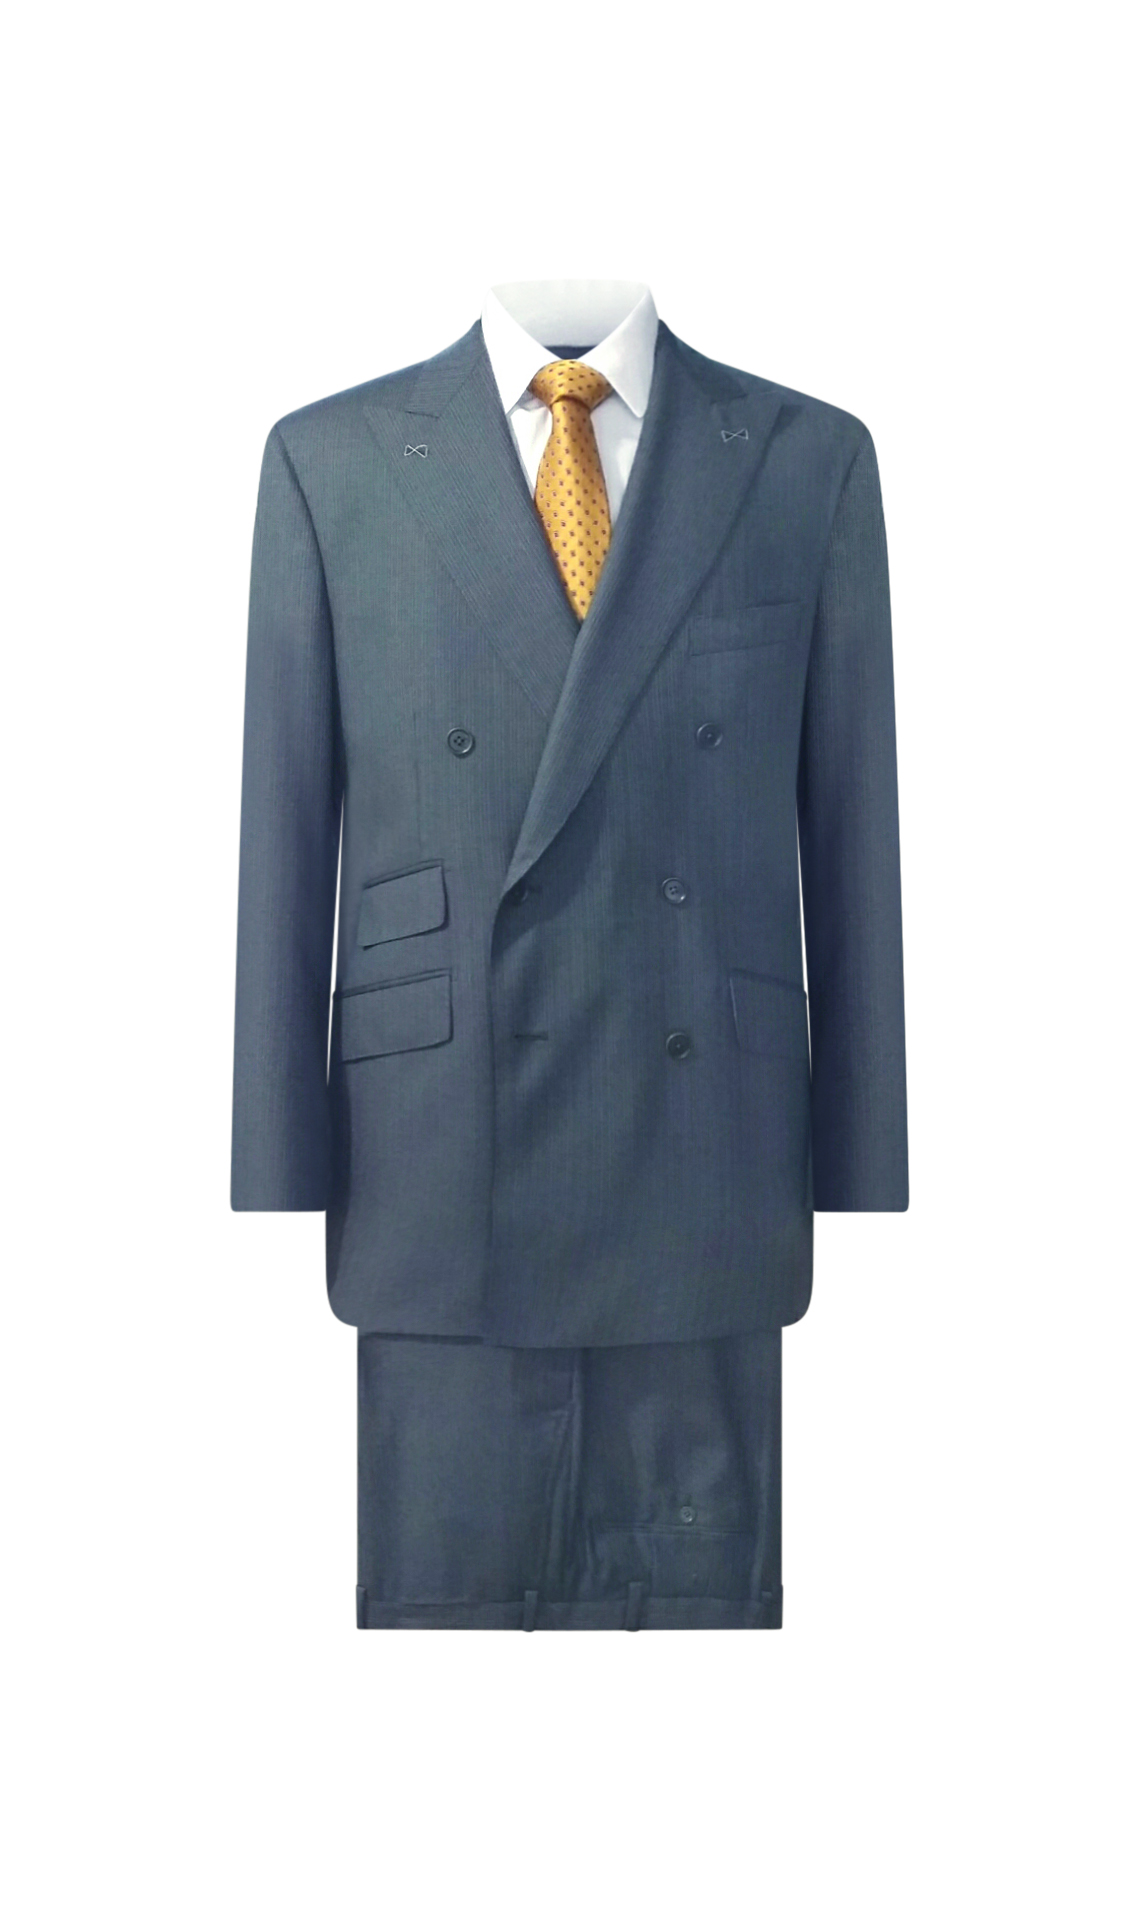 Custom made suits